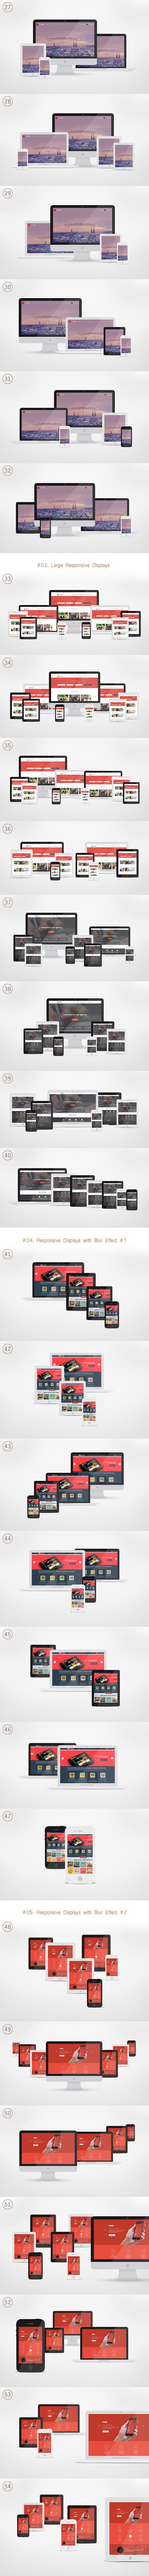 80 Flat Responsive Devices Multipurpose Mock-Ups - 2